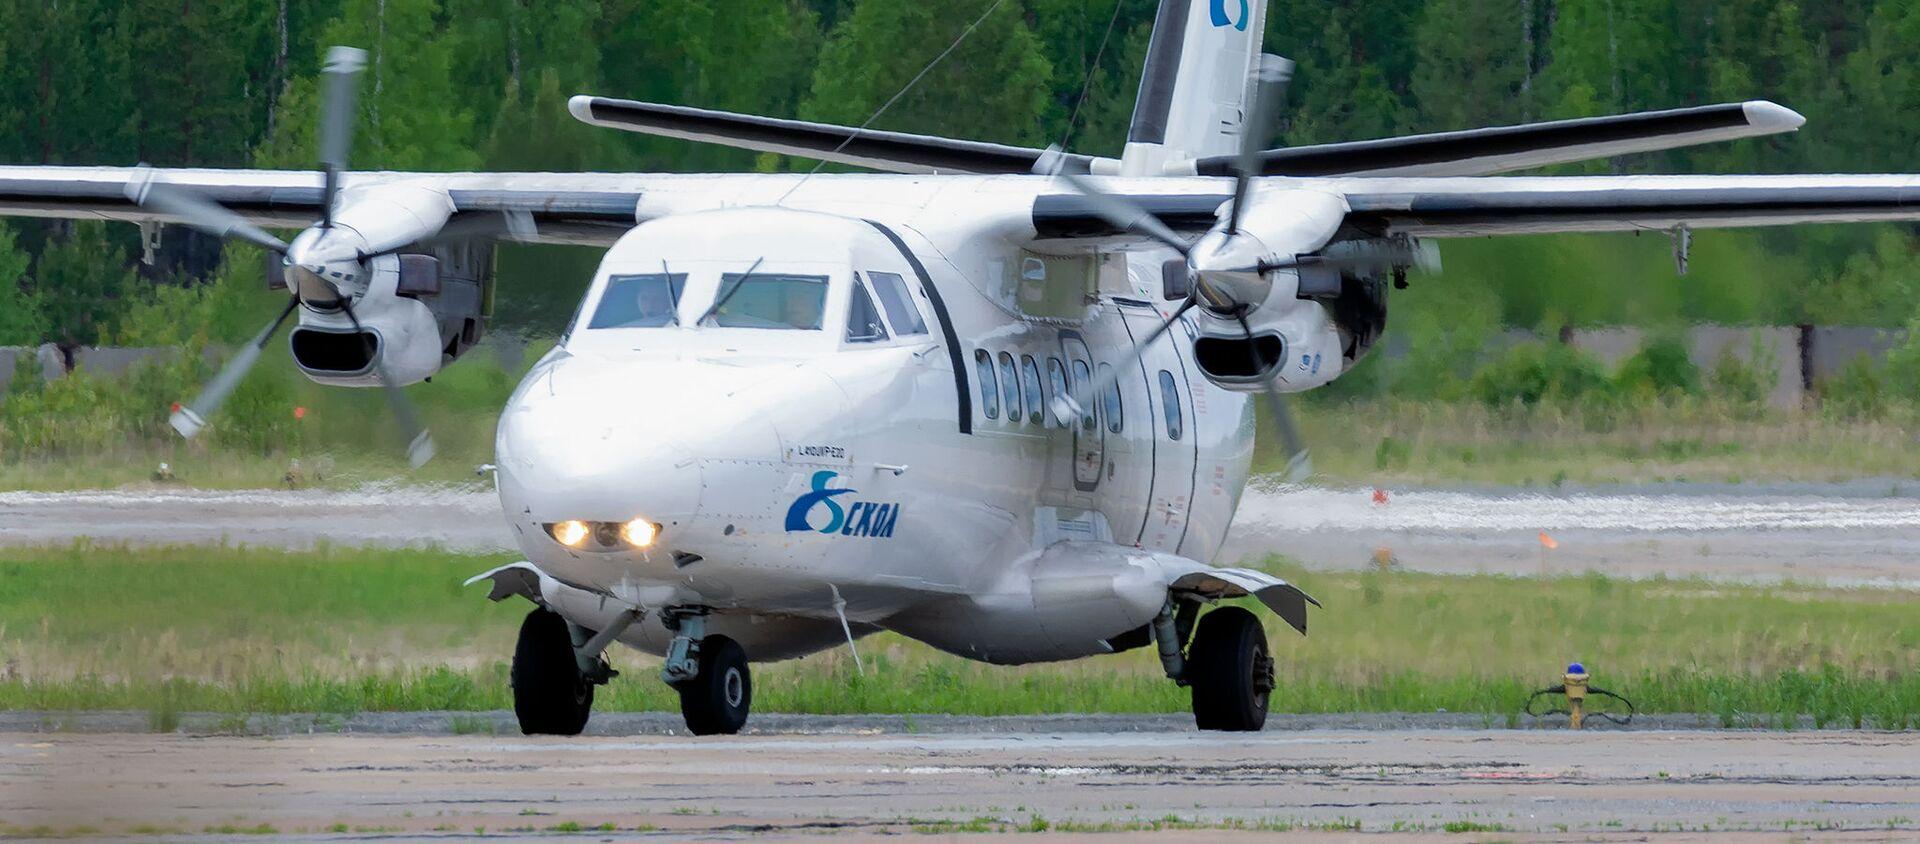 Самолет L-410 авиакомпании СКОЛ - Sputnik Беларусь, 1920, 03.06.2021